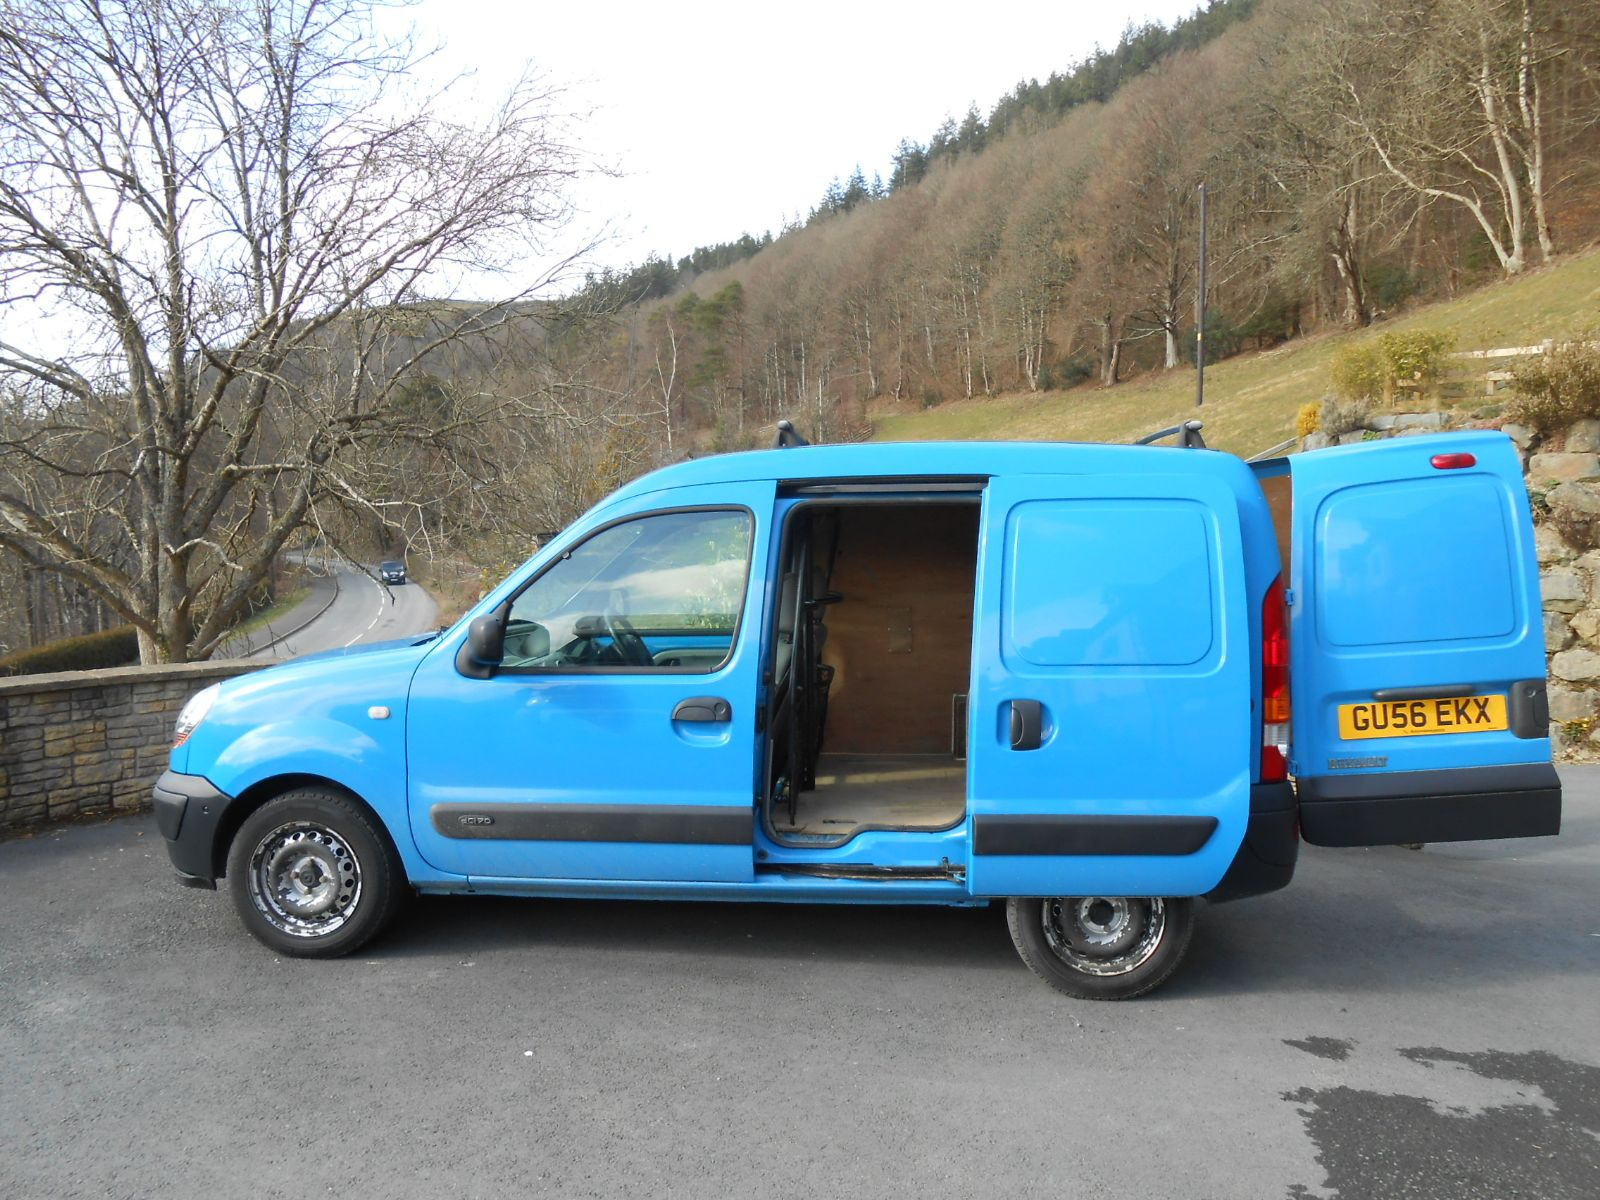 renault kangoo 1 5 dci sl17 70 car for sale llanidloes powys mid wales kevin jones cars used. Black Bedroom Furniture Sets. Home Design Ideas